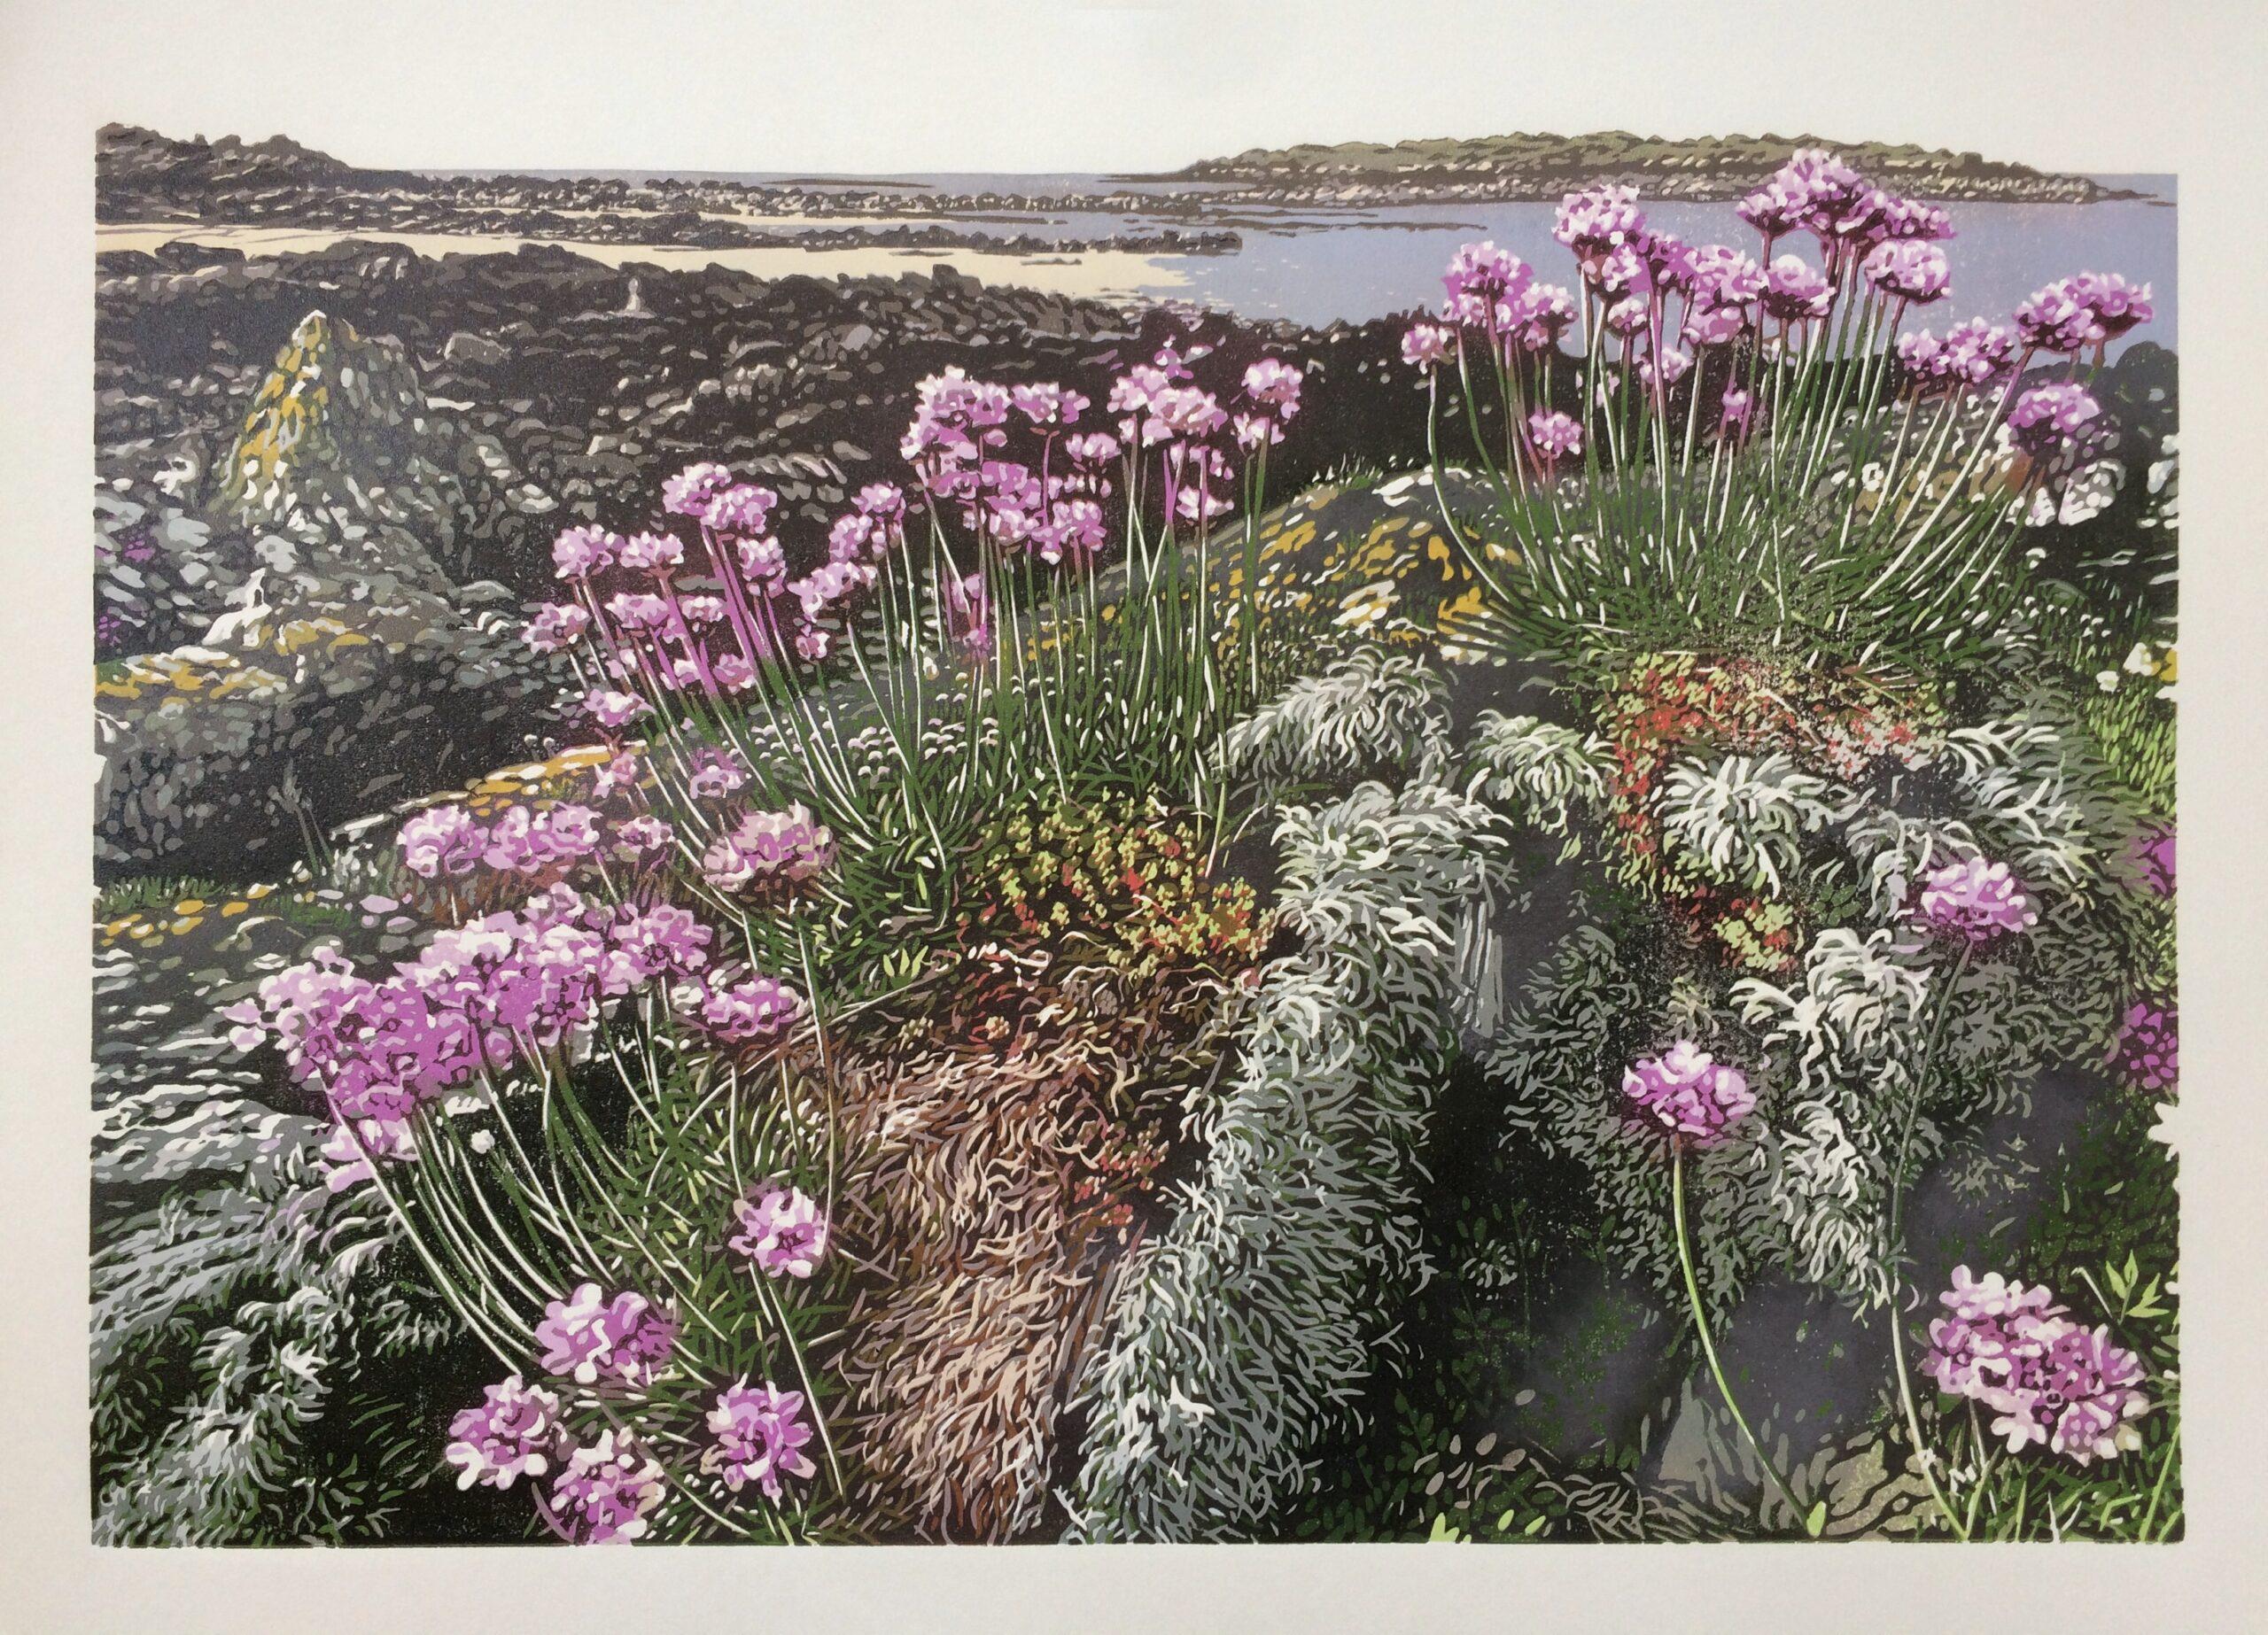 Joshua Miles reduciton linocut of coastal landscape with pink thrift flowers